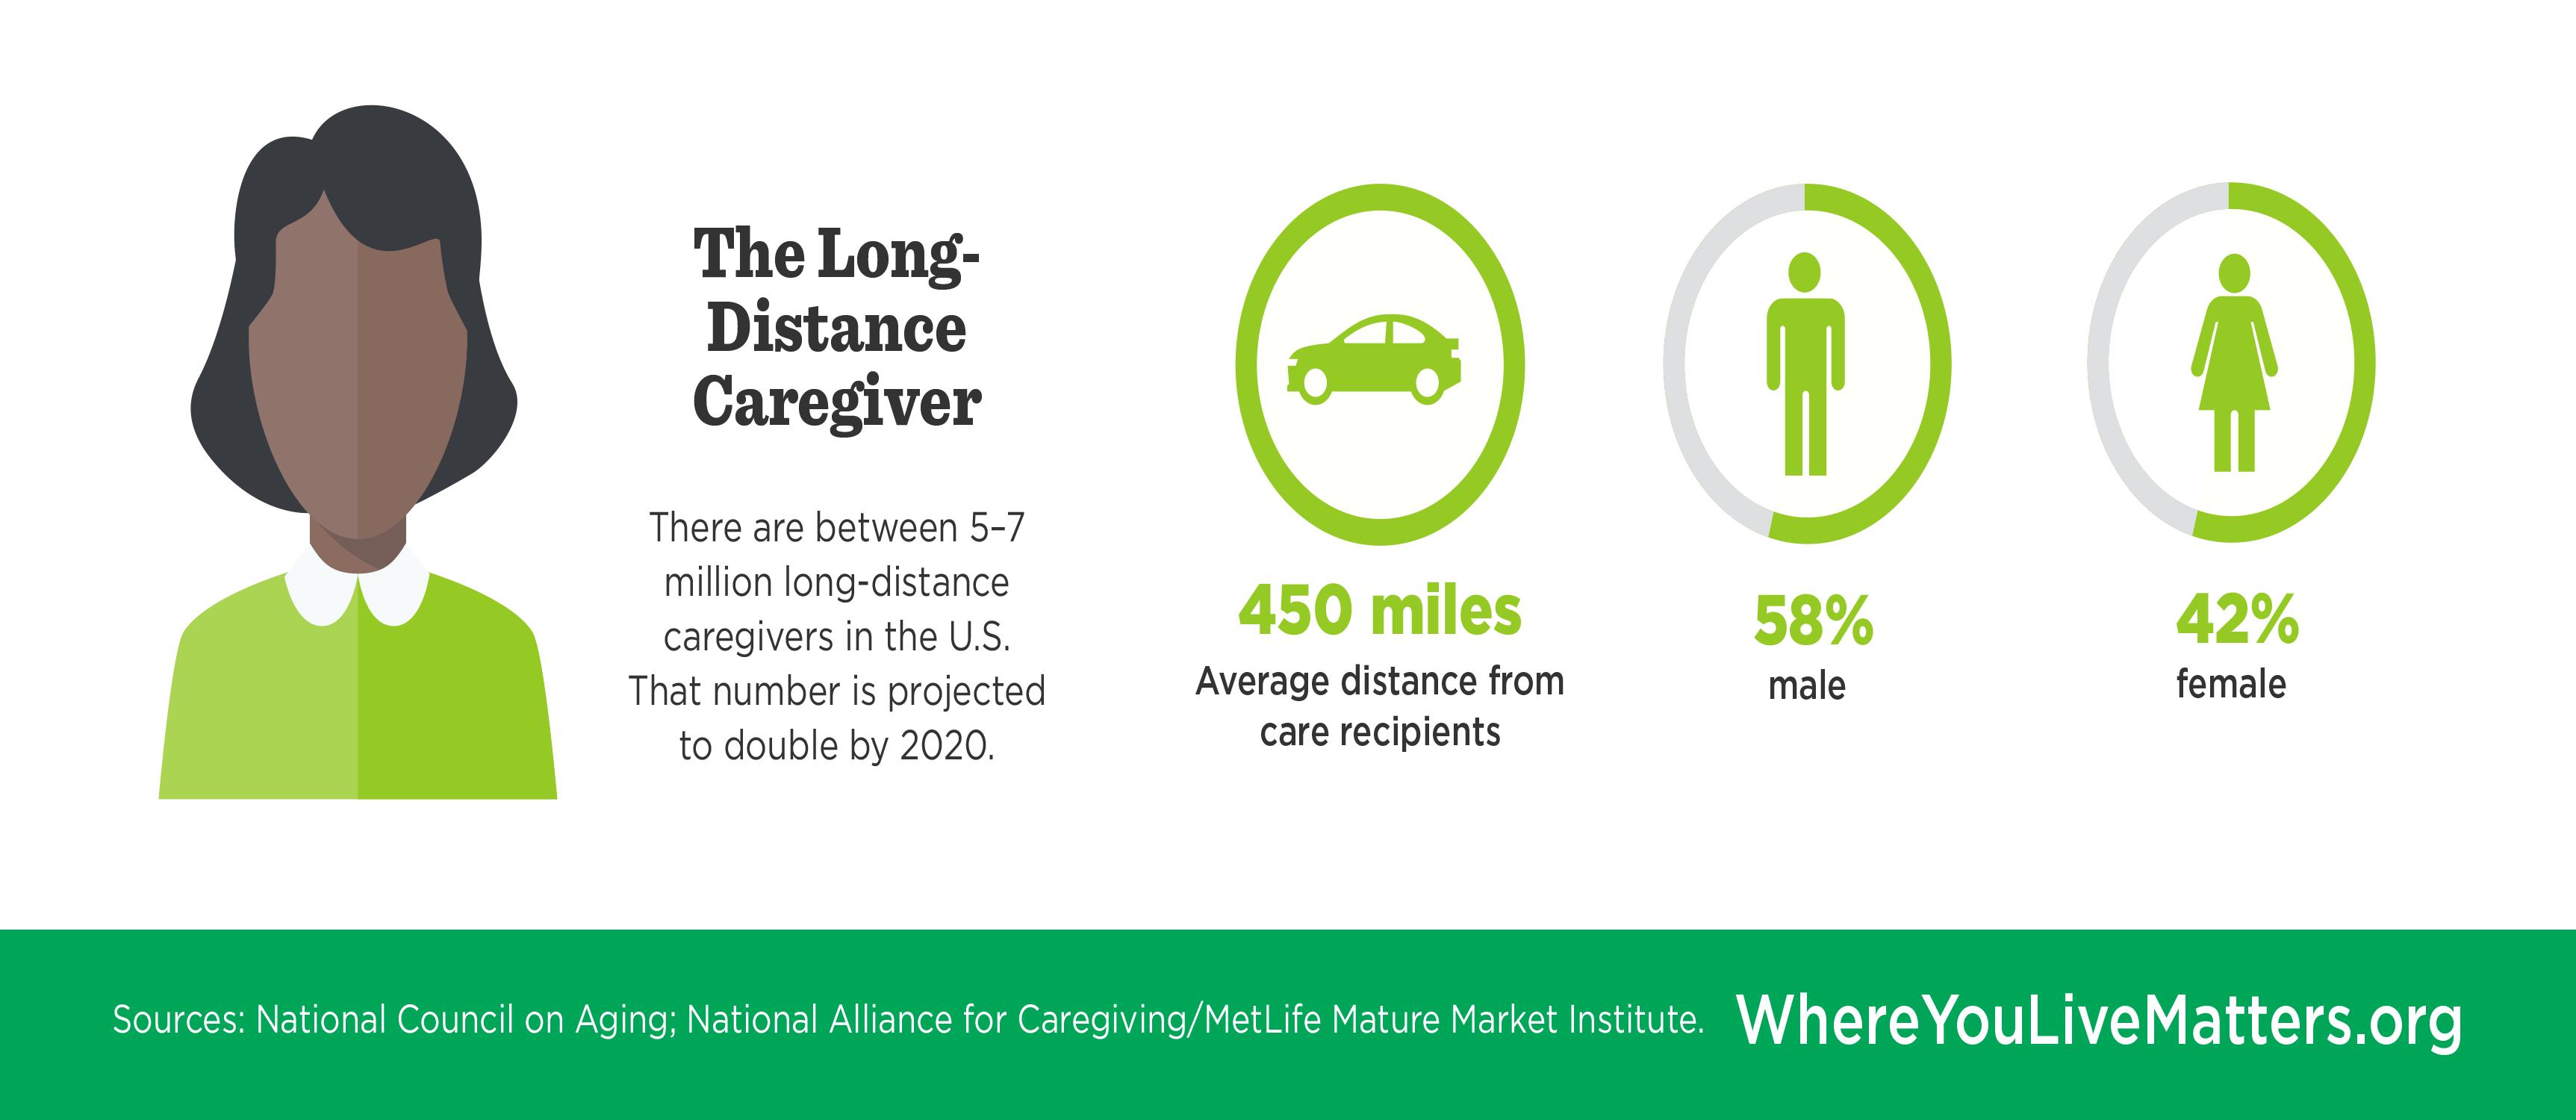 The Long Distance Caregiver